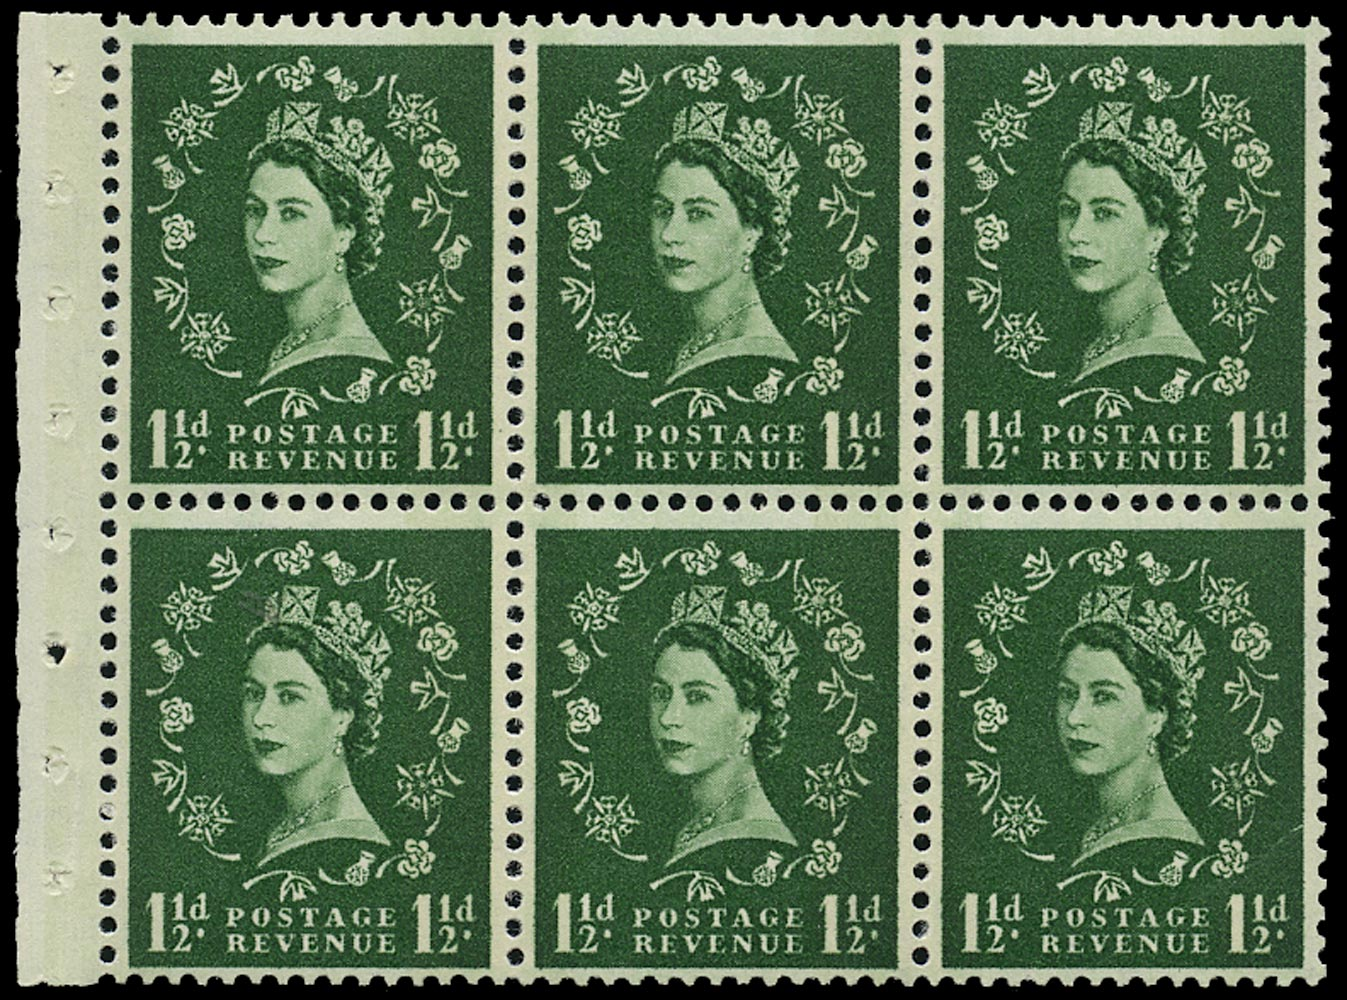 GB 1960  SG612l Booklet pane - Wmk. Crowns, Green Phosphor